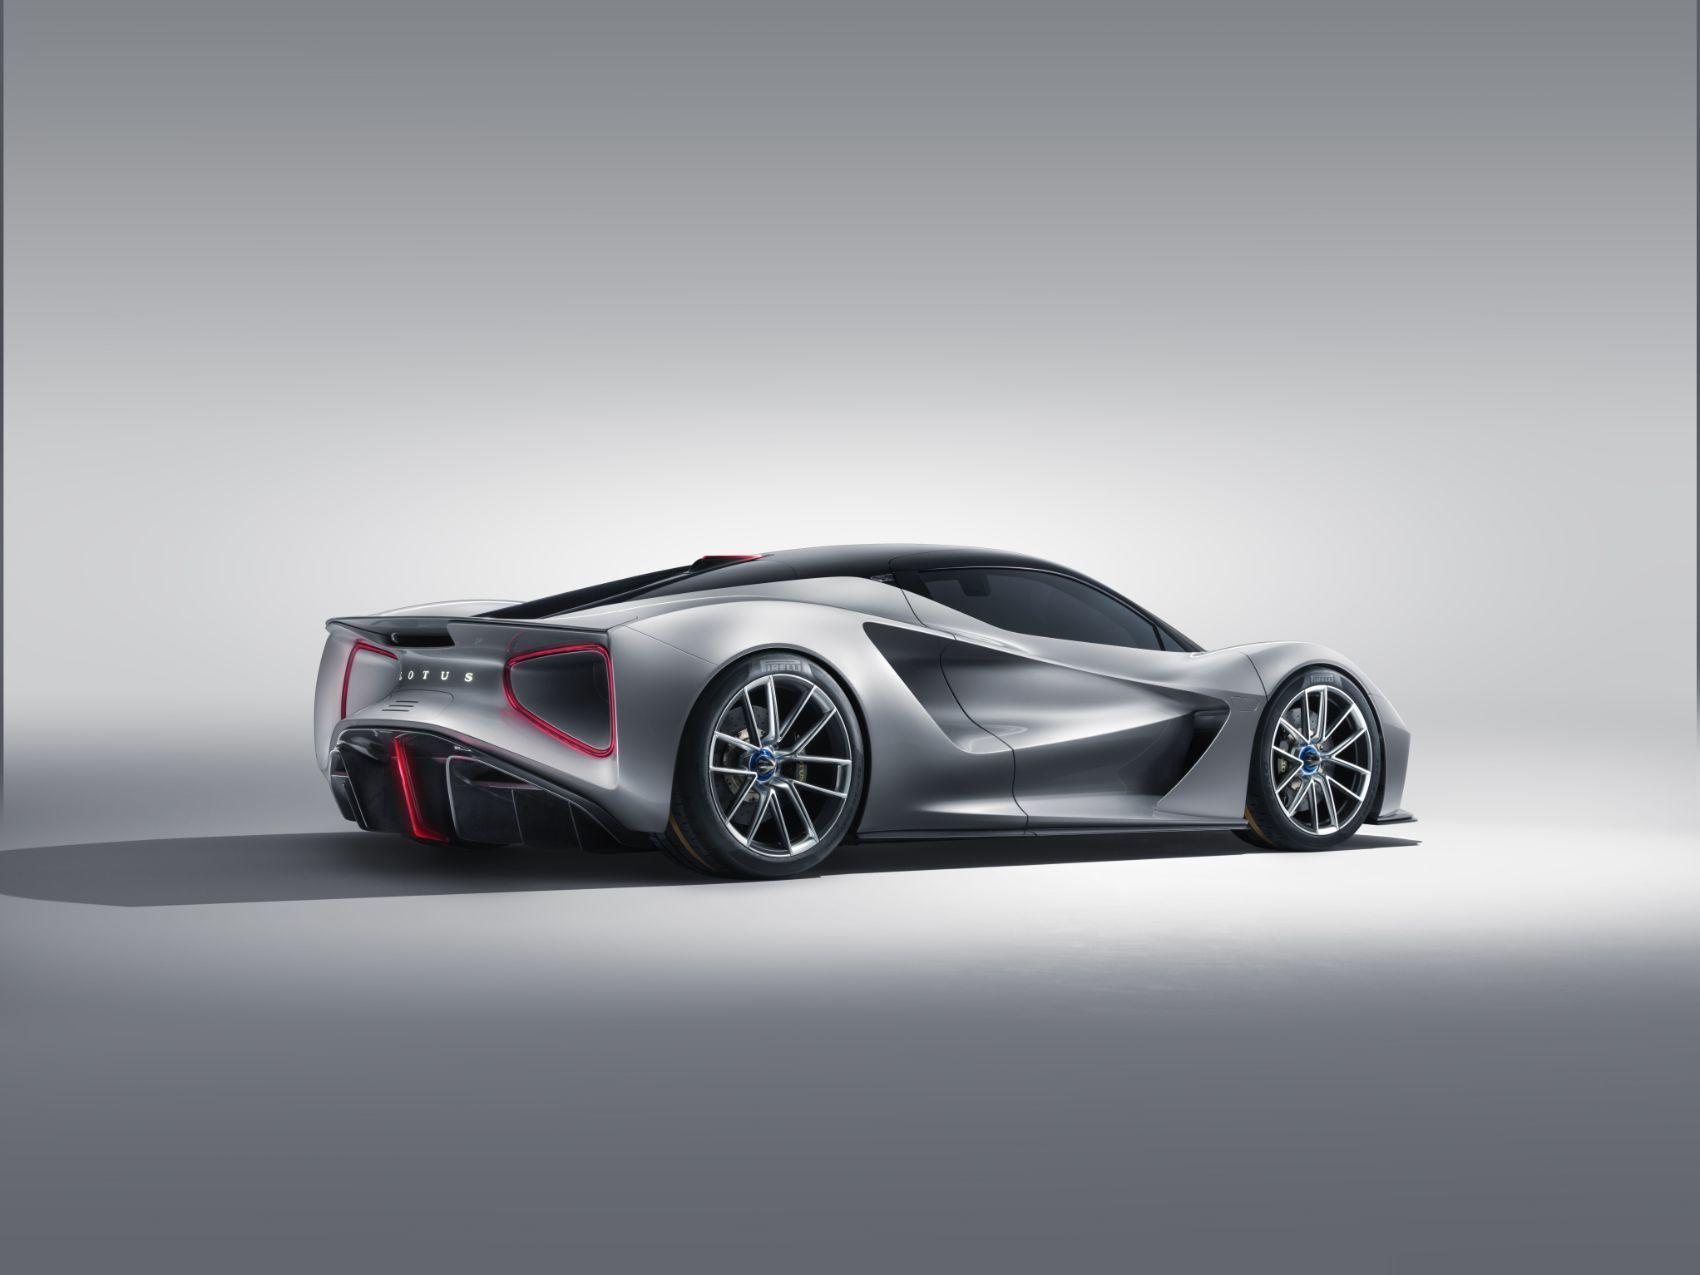 Lotus Evija: A Technical Overview & In-Depth Look